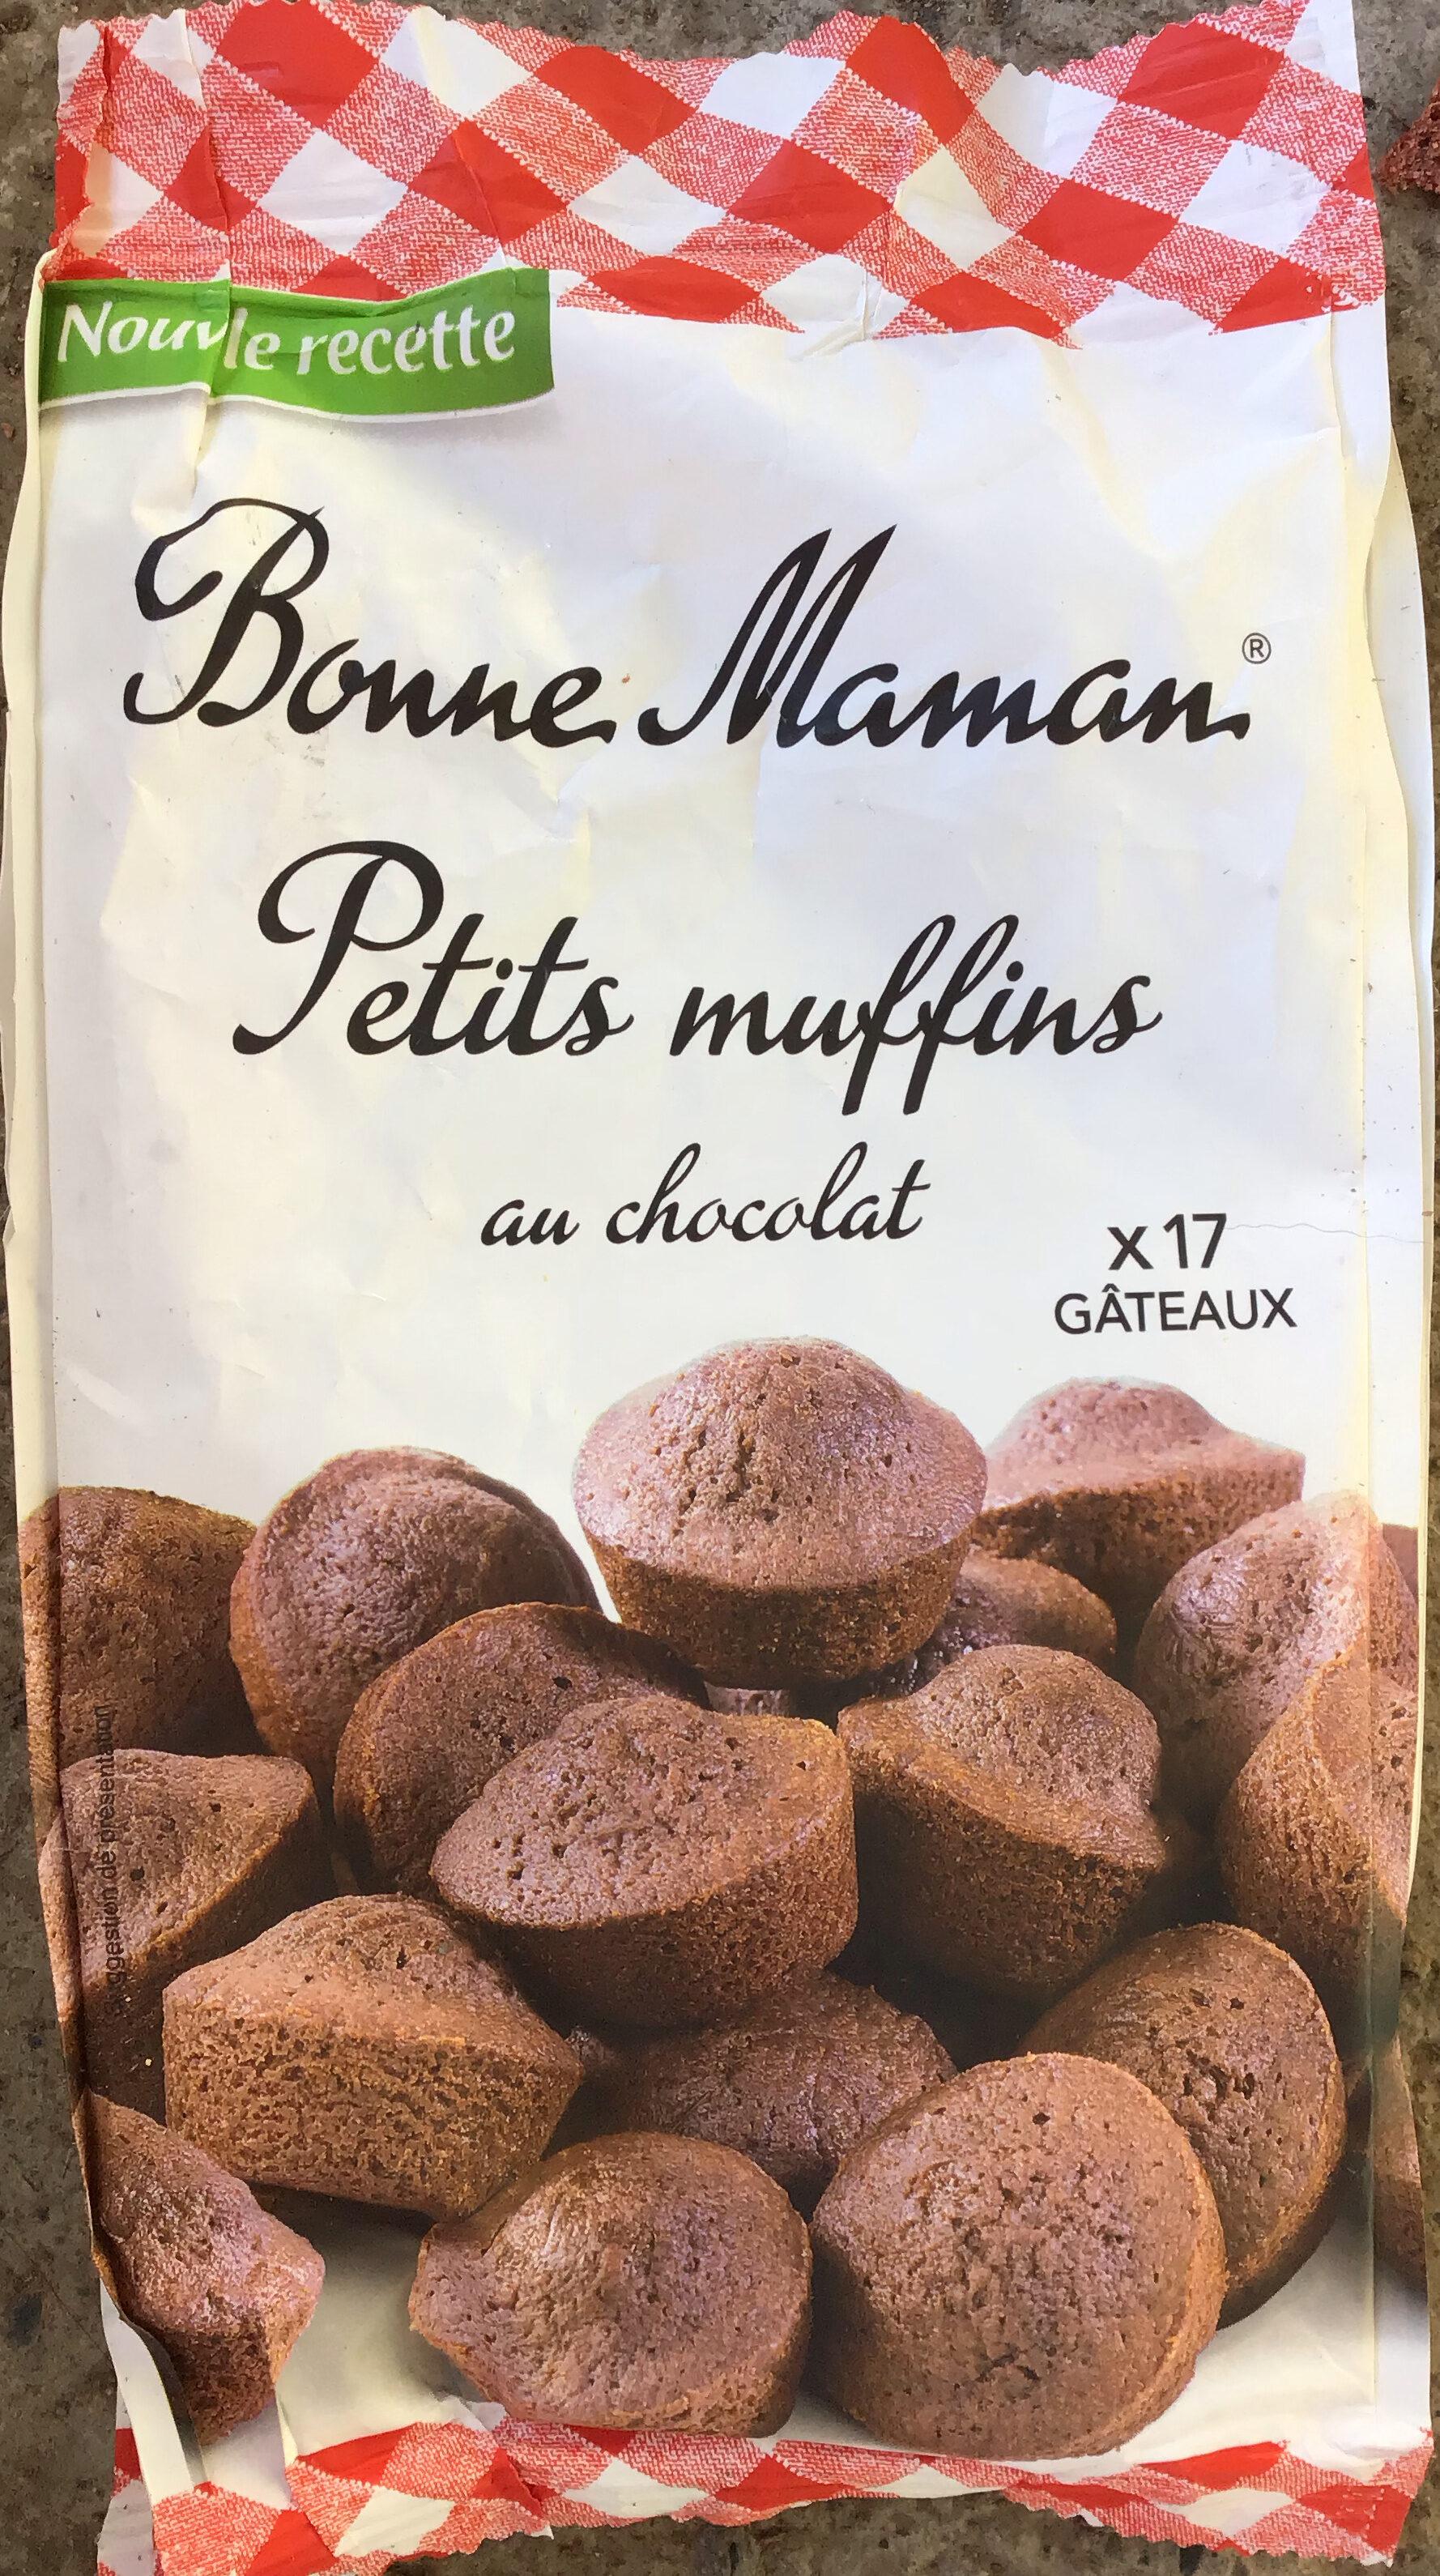 Petits muffins au chocolat - Product - fr